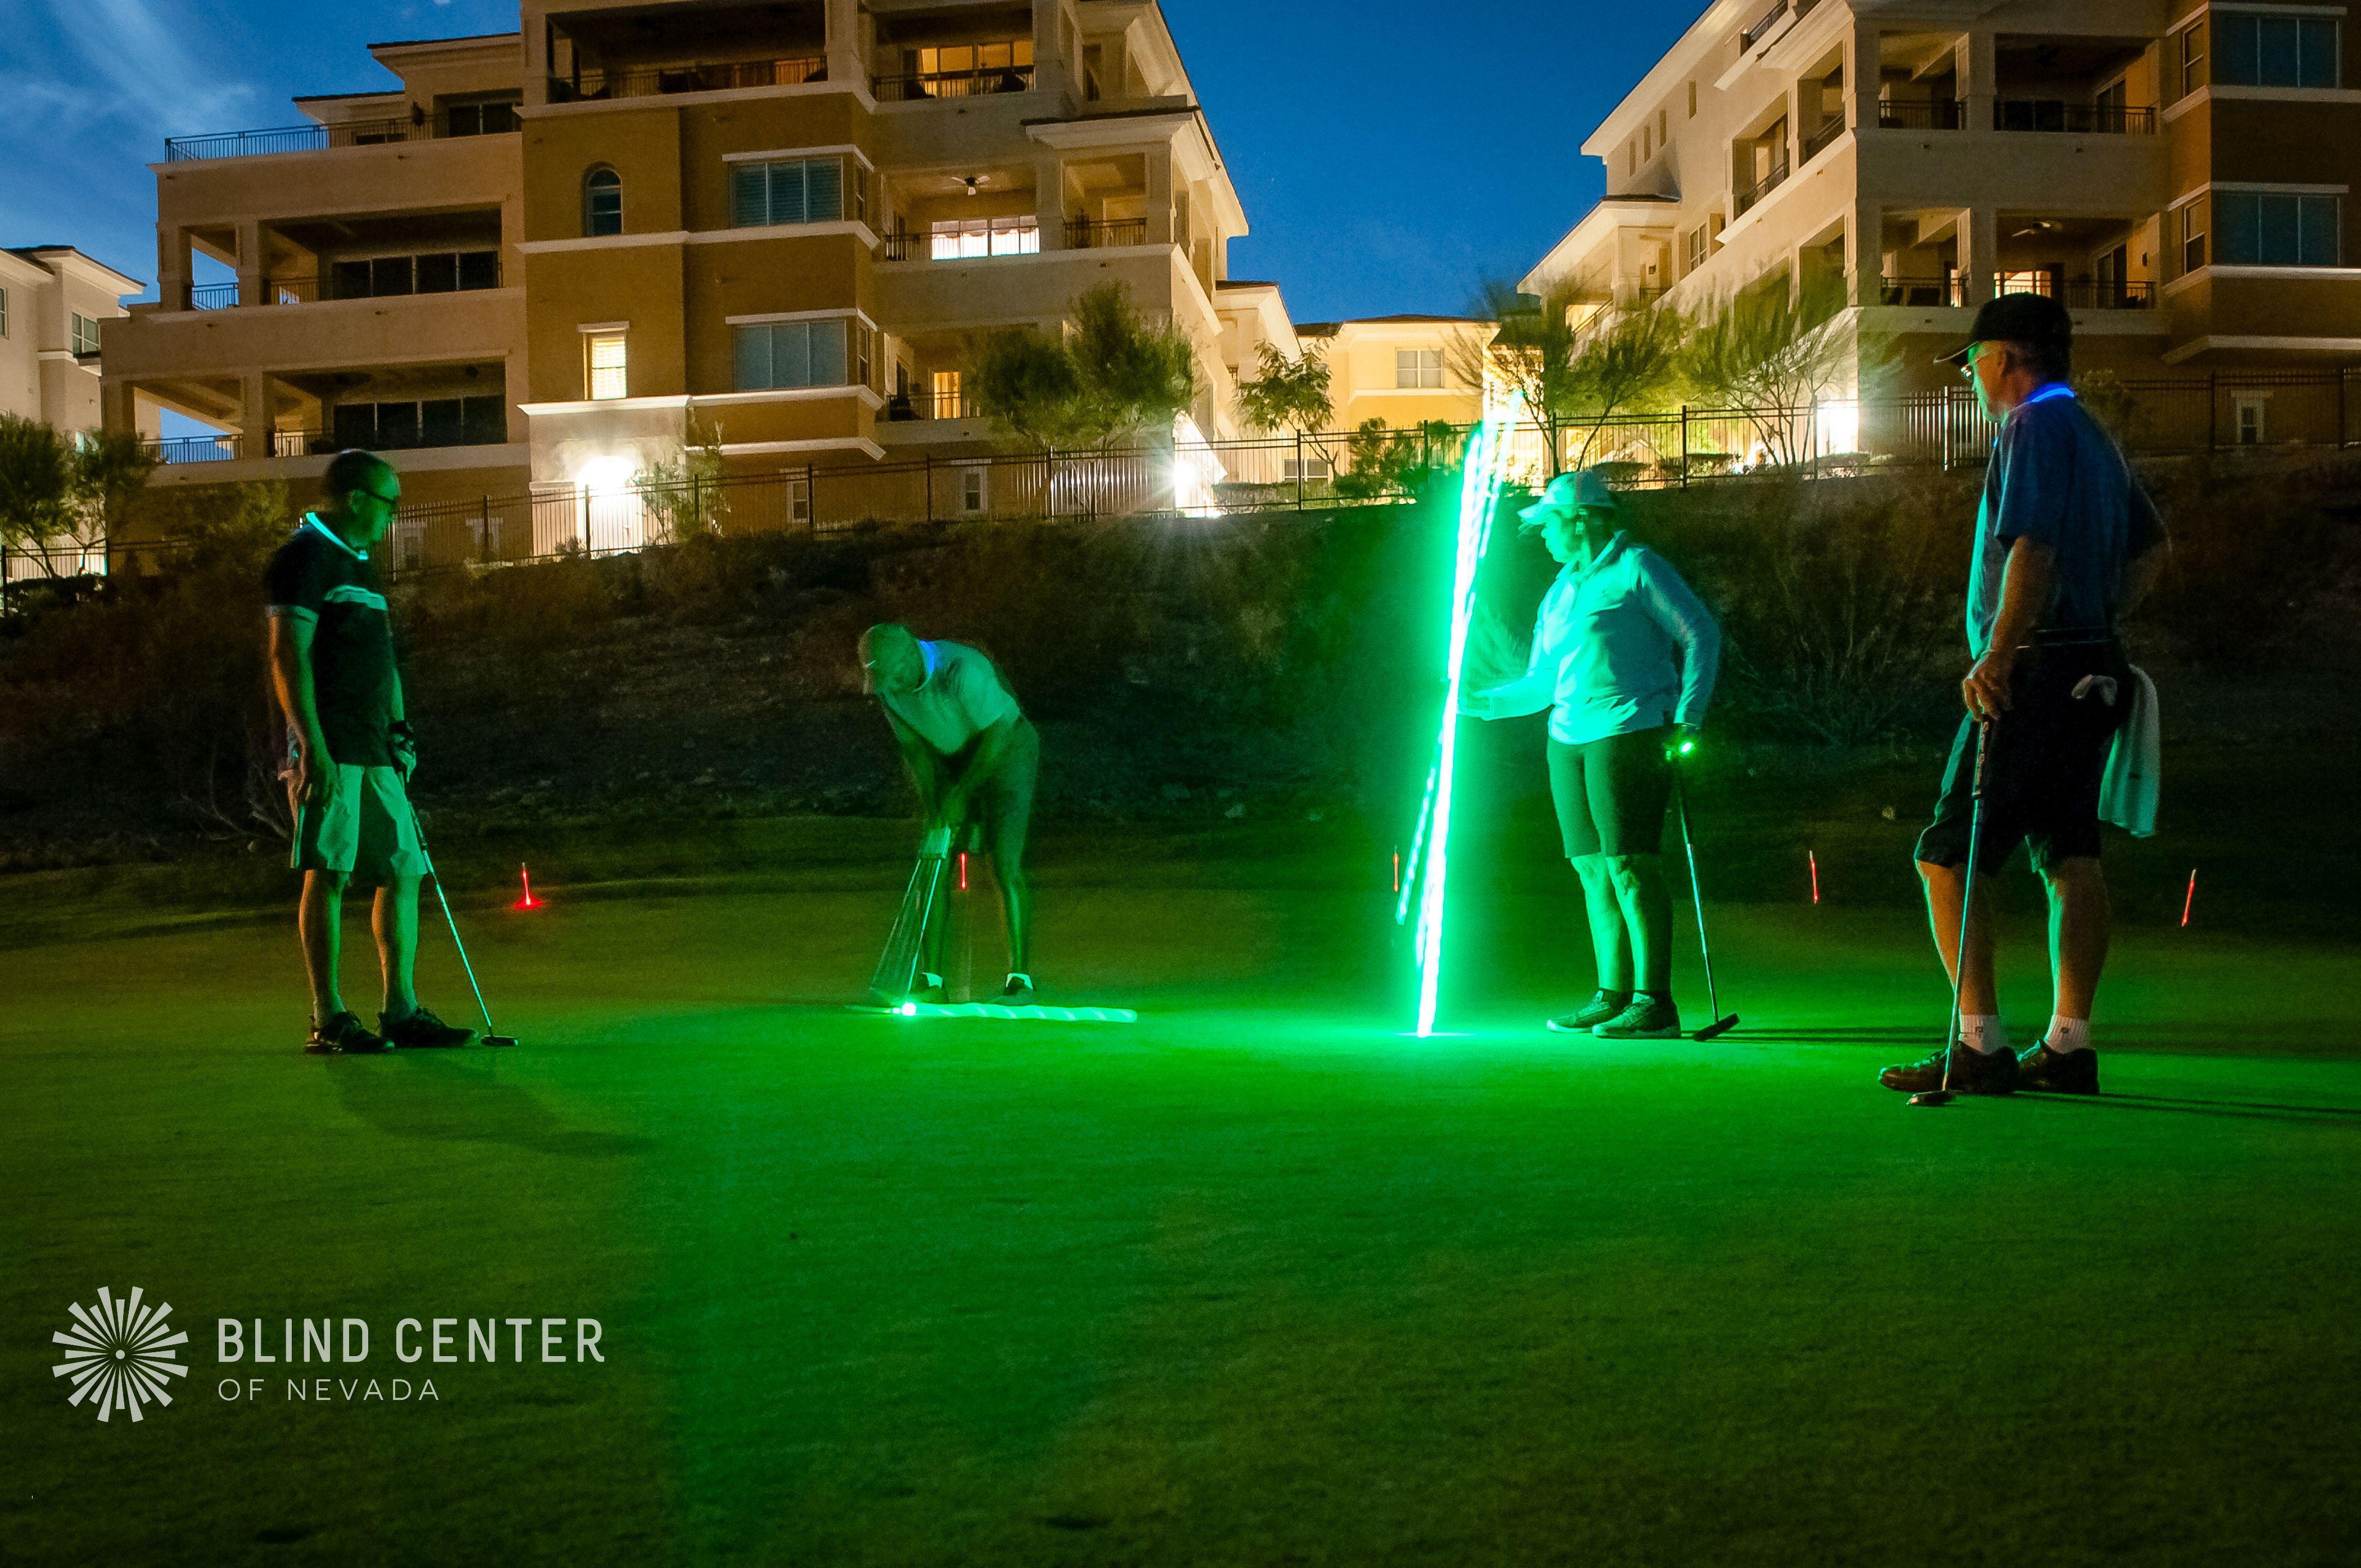 8th Annual Blind Center Glow Golf Tournament